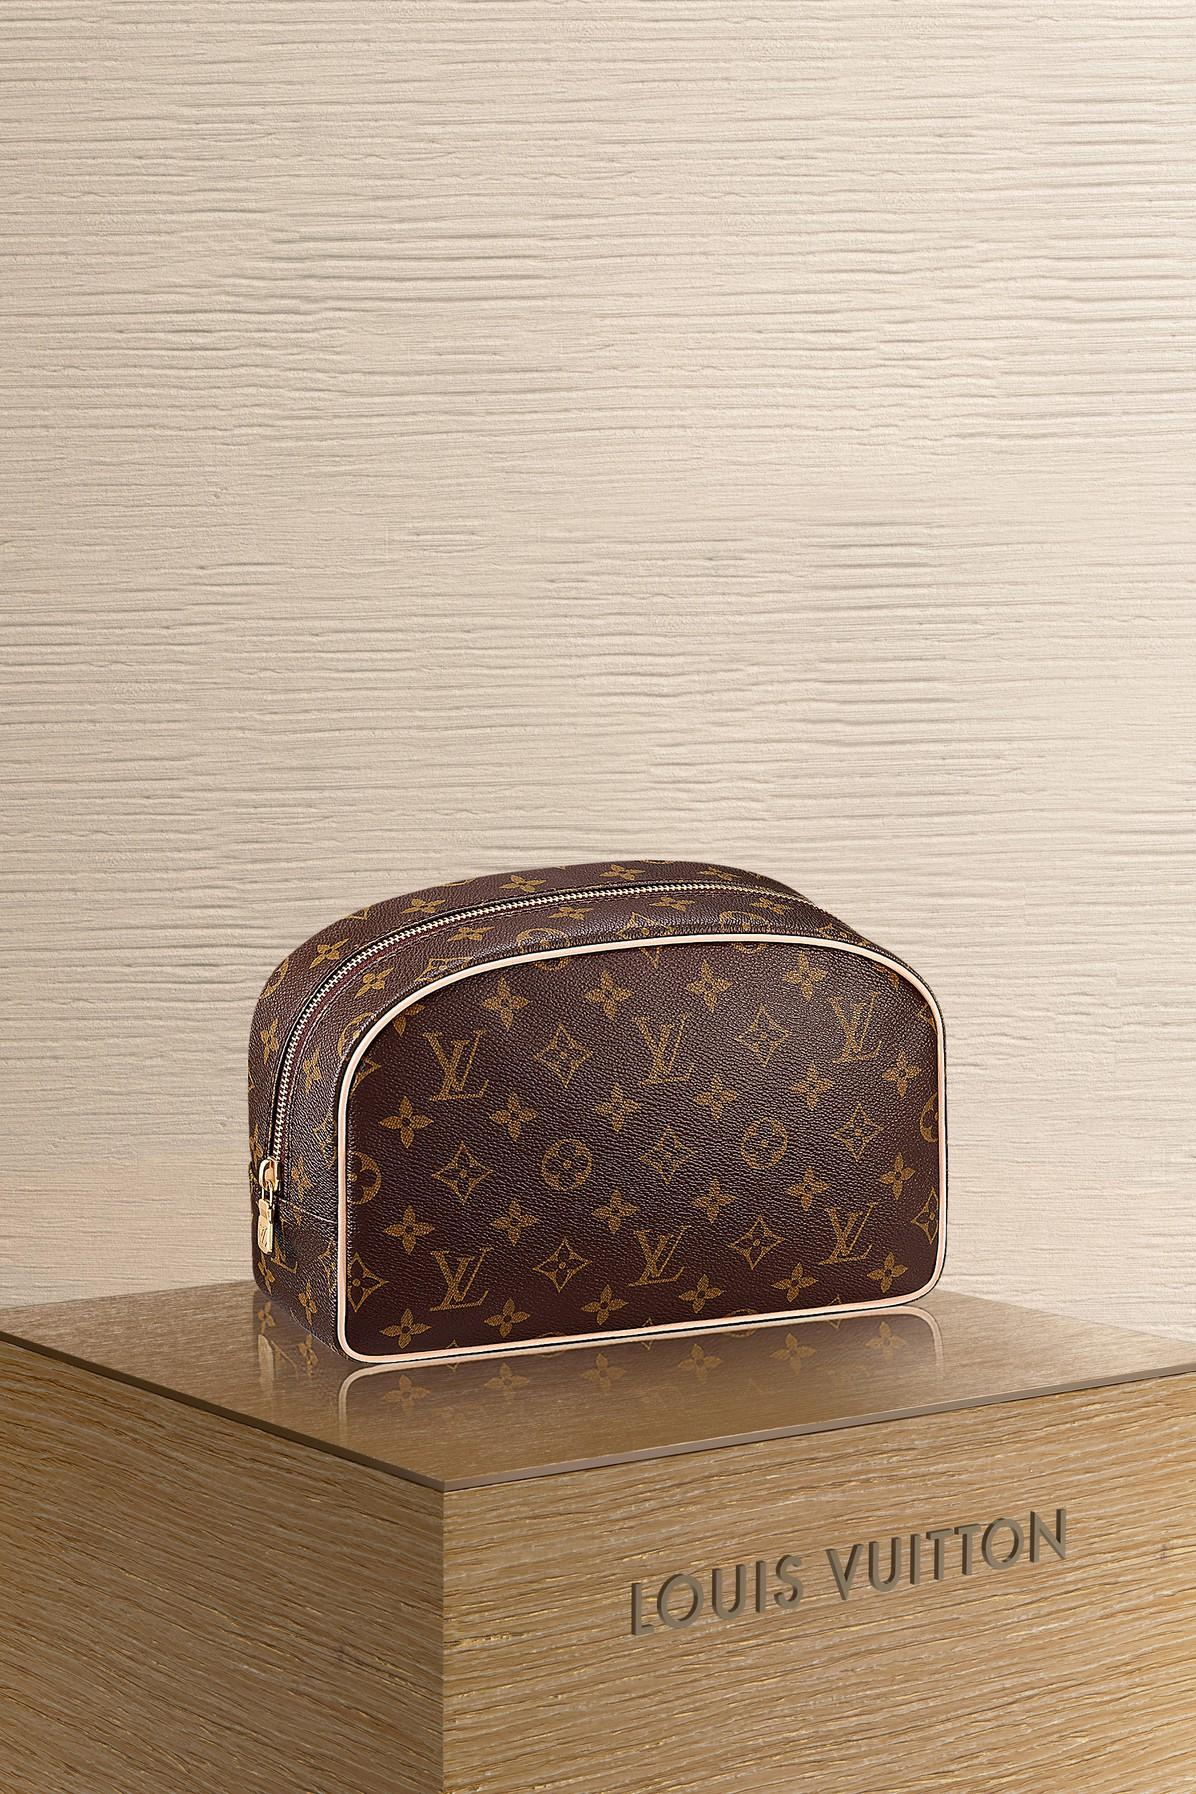 Louis Vuitton Toiletry Bag 25 Modesens The official instagram account of louis vuitton. louis vuitton toiletry bag 25 modesens